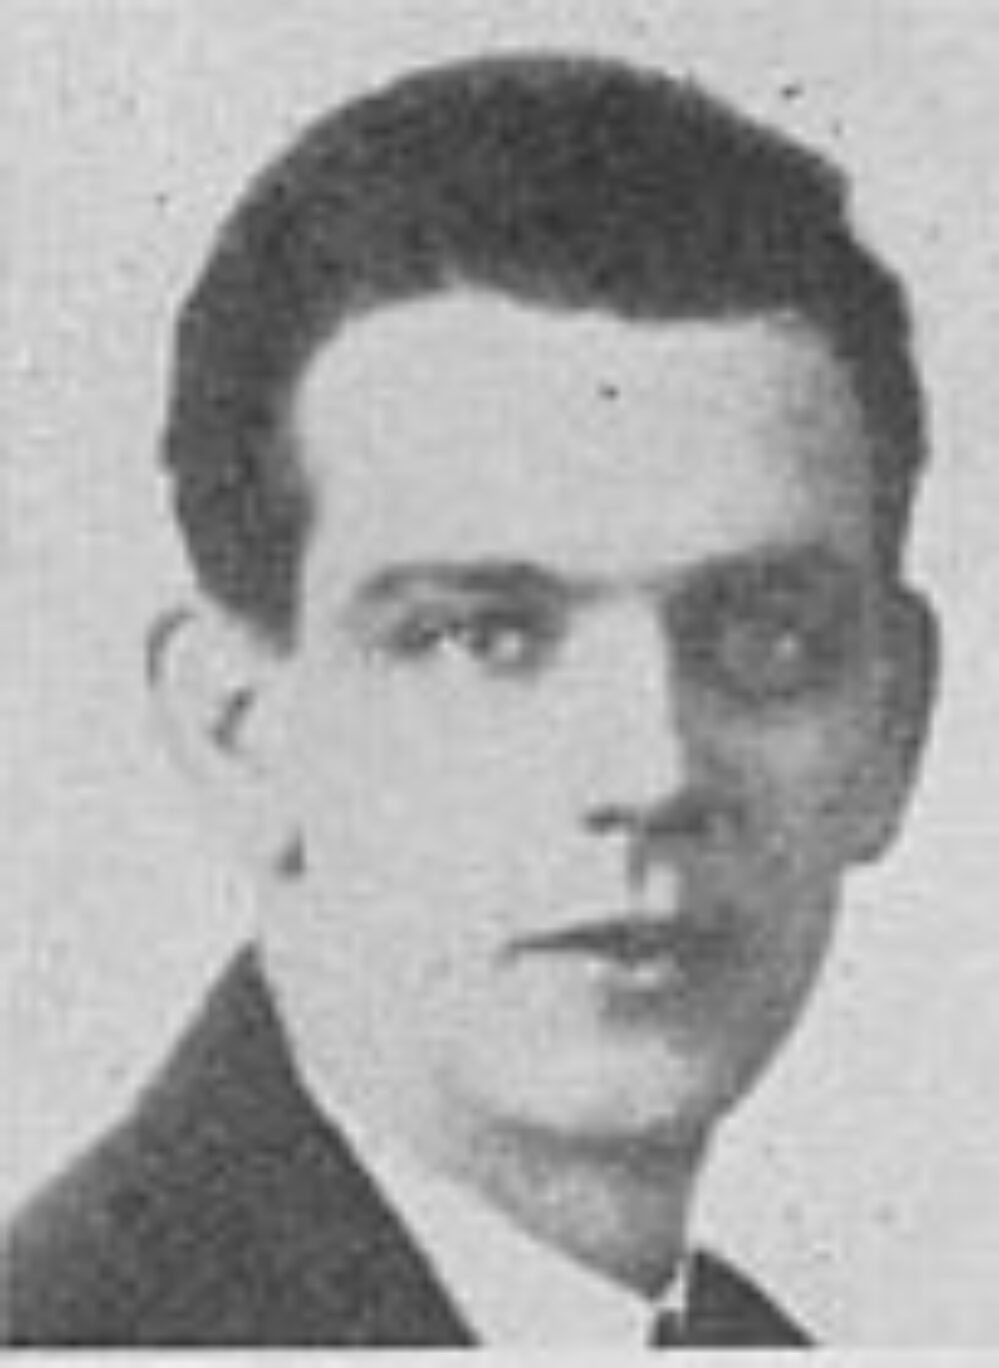 Sigurd Johannes Jamne